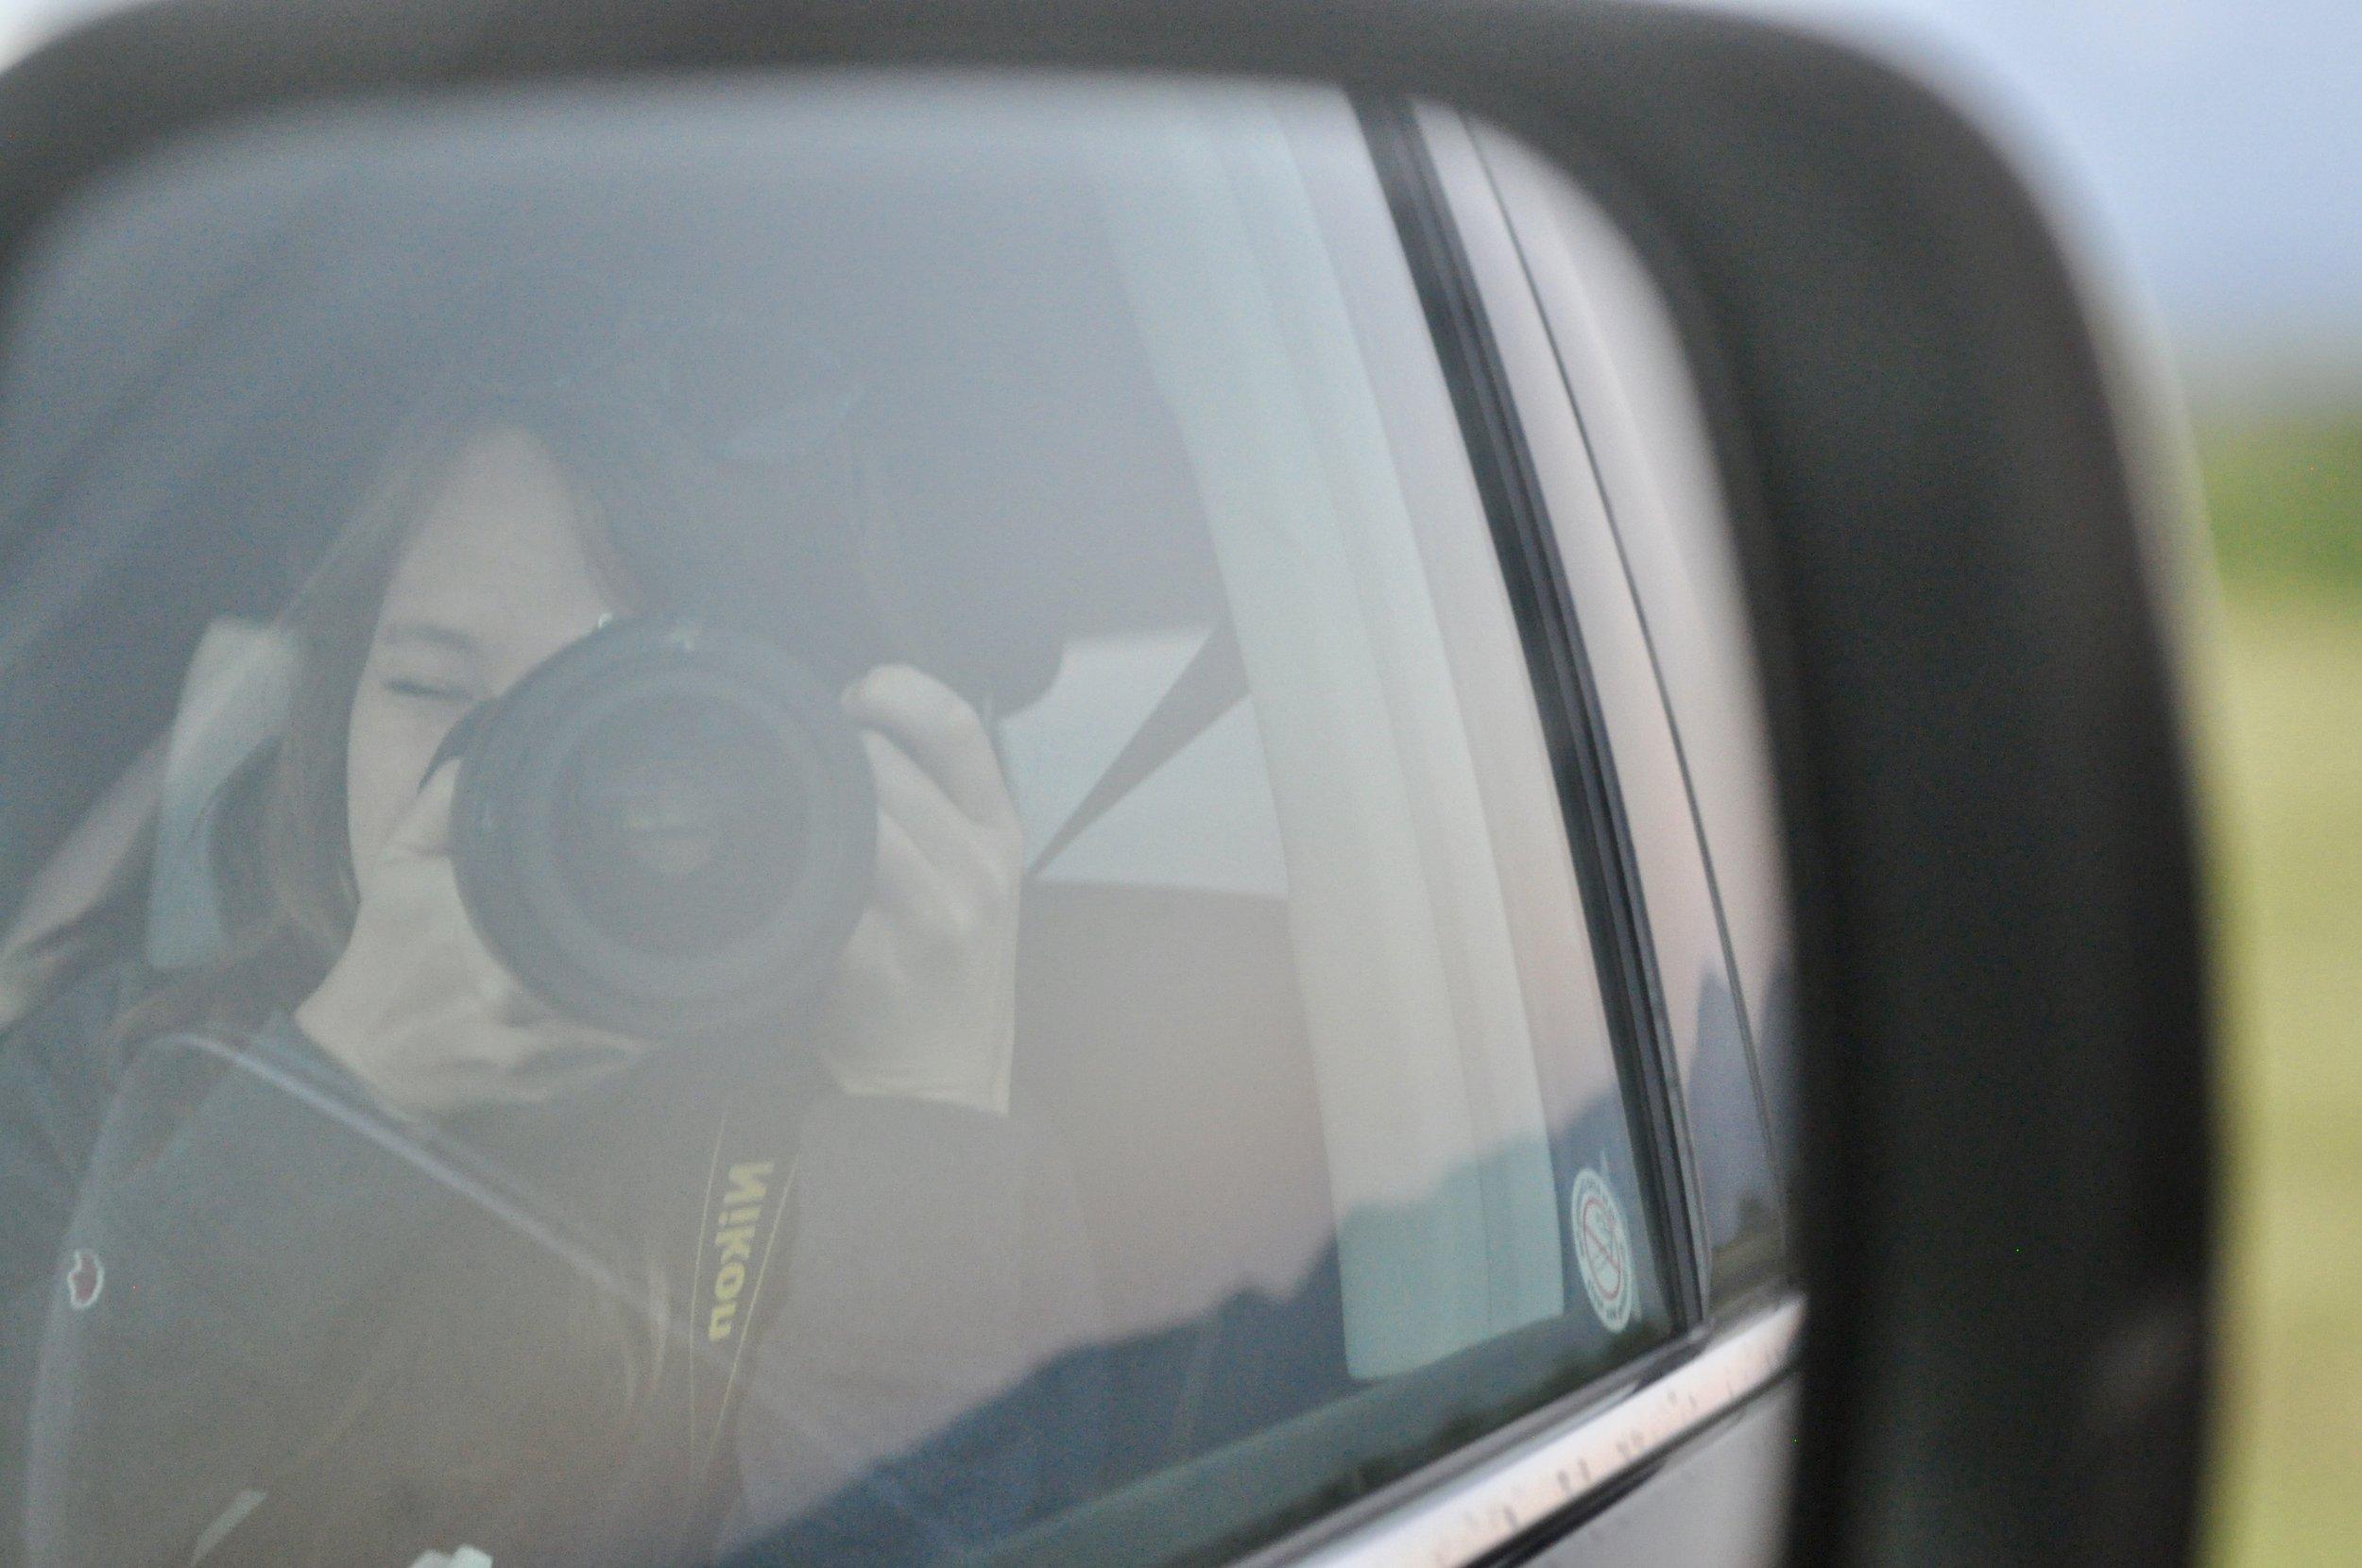 On the road again (eeeee! I love traveling).